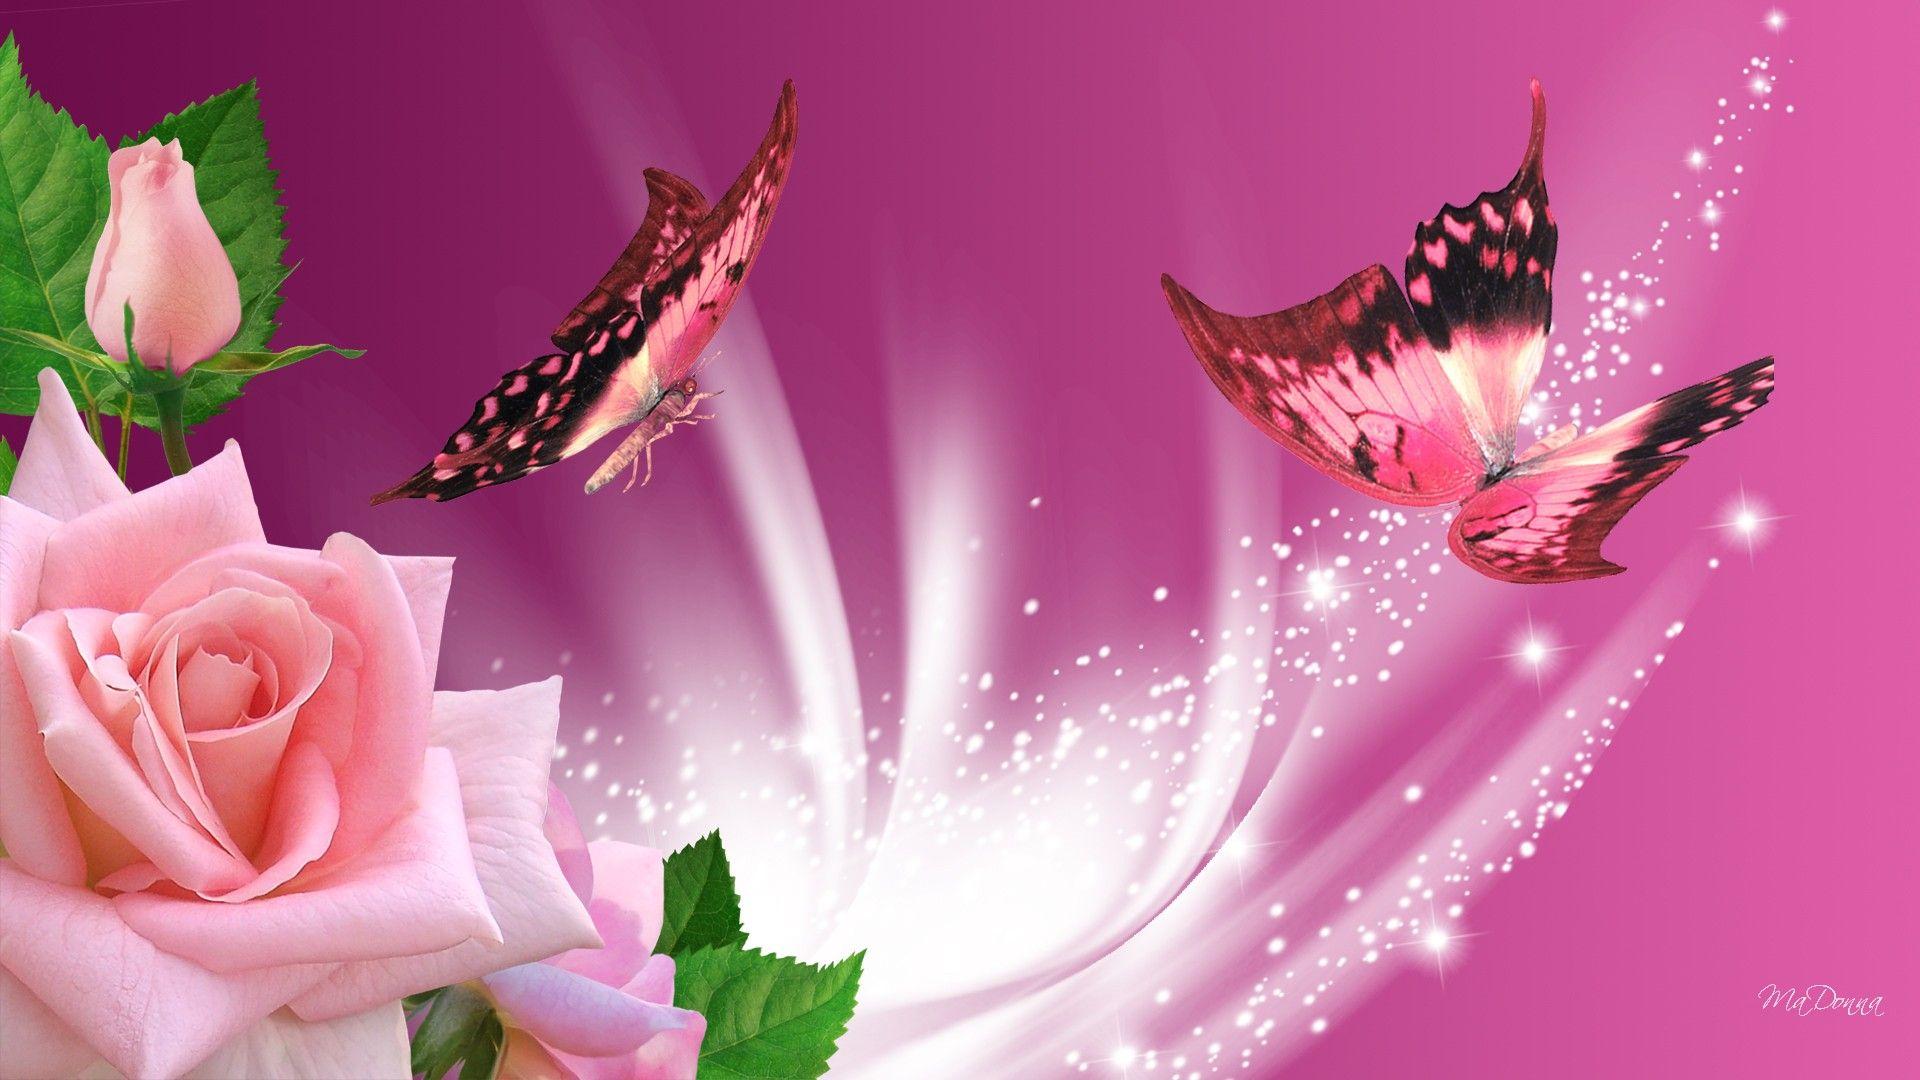 pinkbutterfliesroses221561.jpg (1920×1080) Butterfly